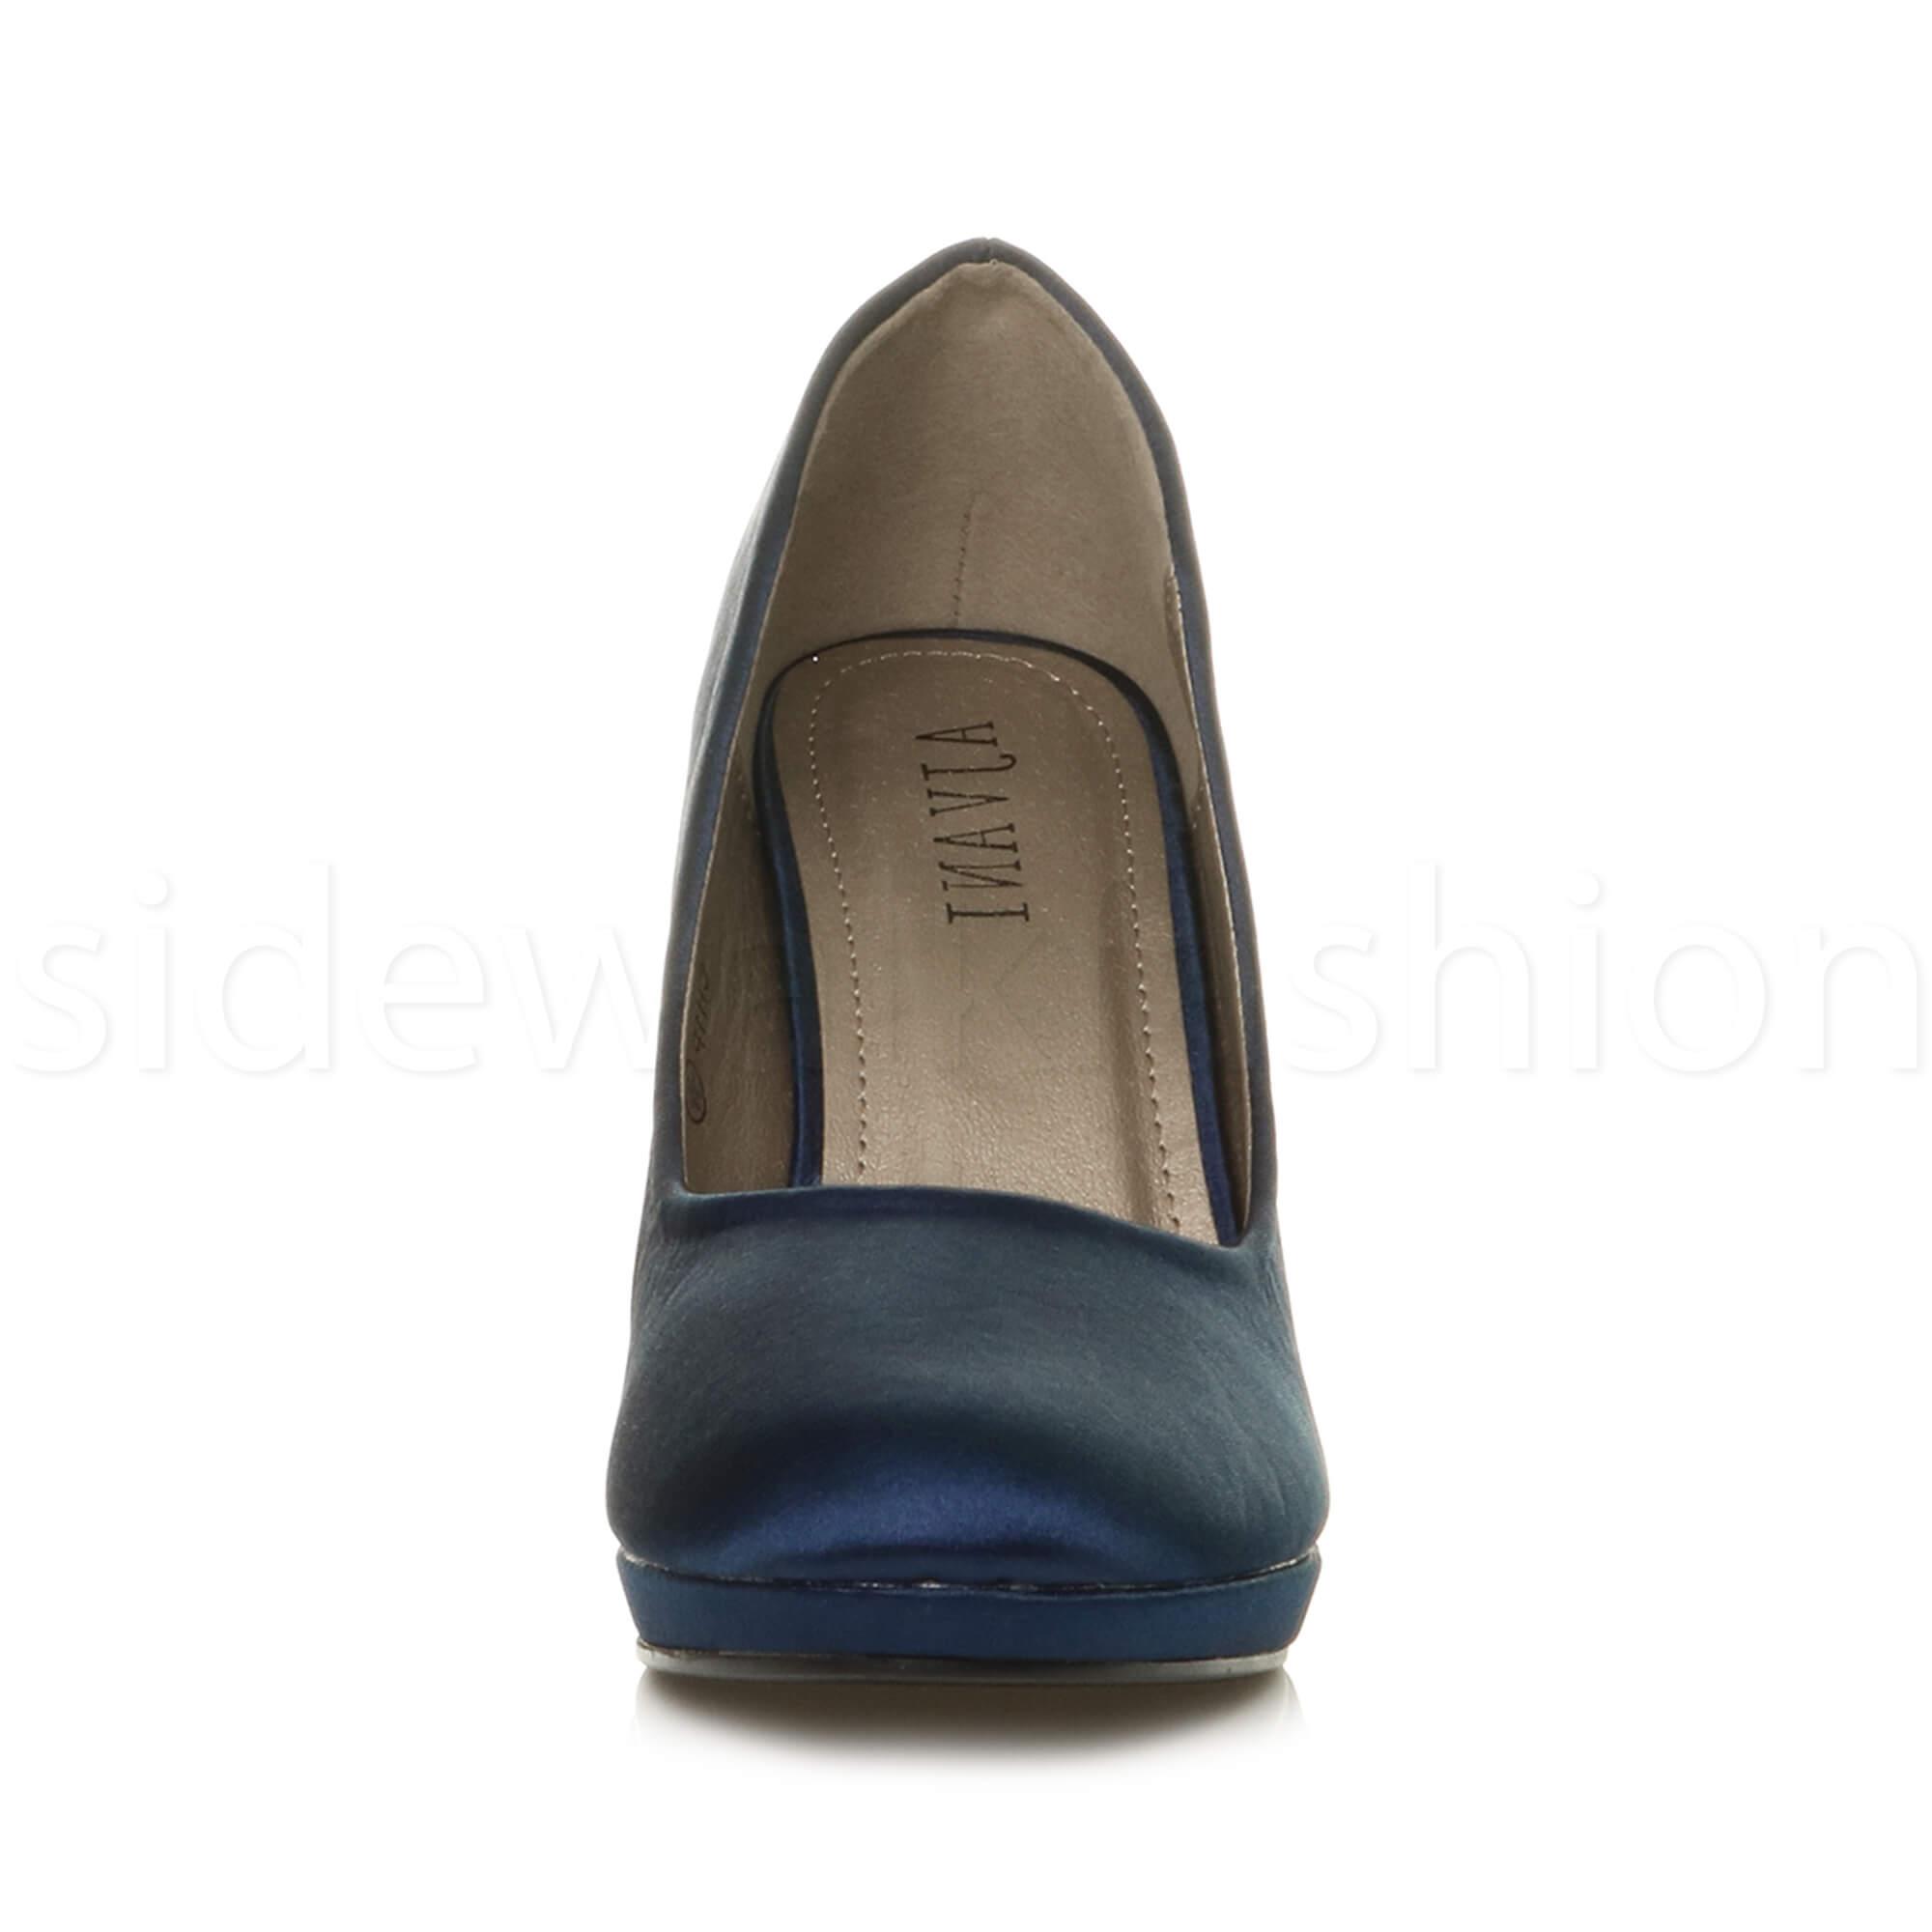 Womens-ladies-high-mid-heel-platform-wedding-evening-bridesmaid-court-shoes-size thumbnail 118